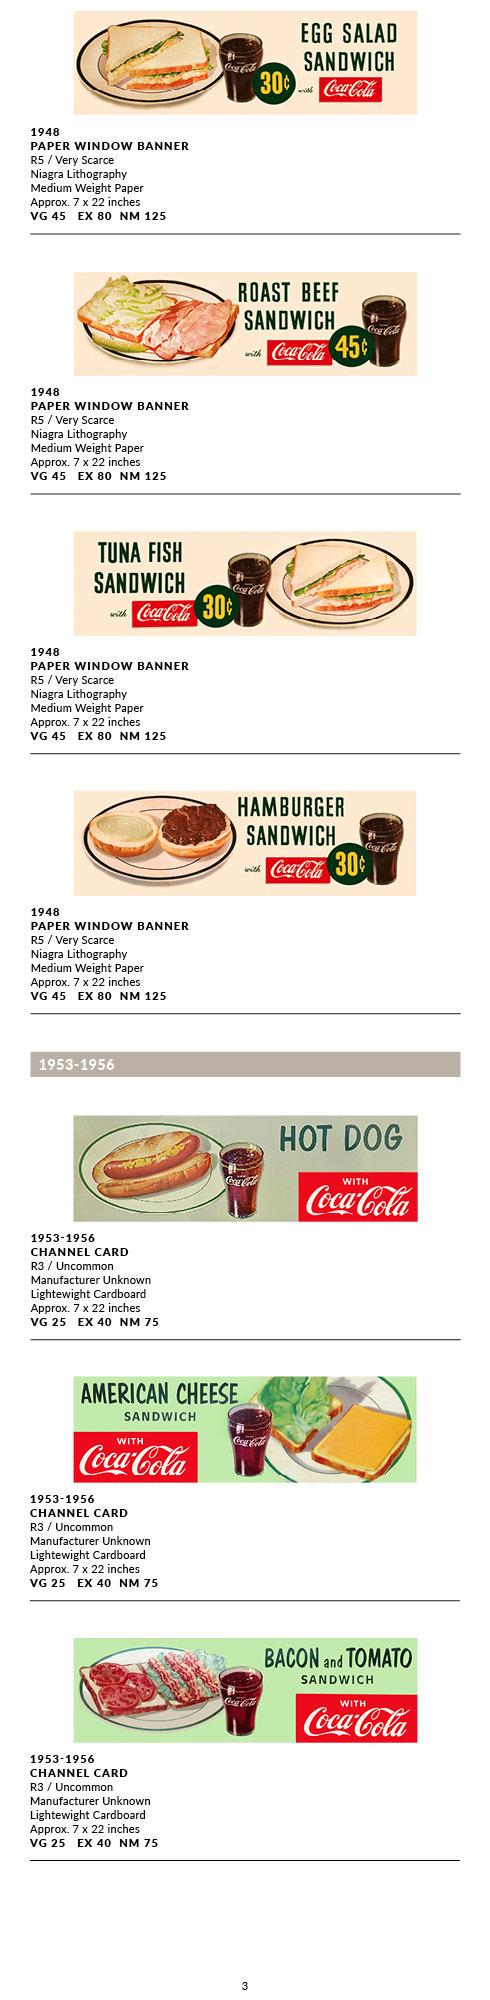 Food Channel Card3.jpg